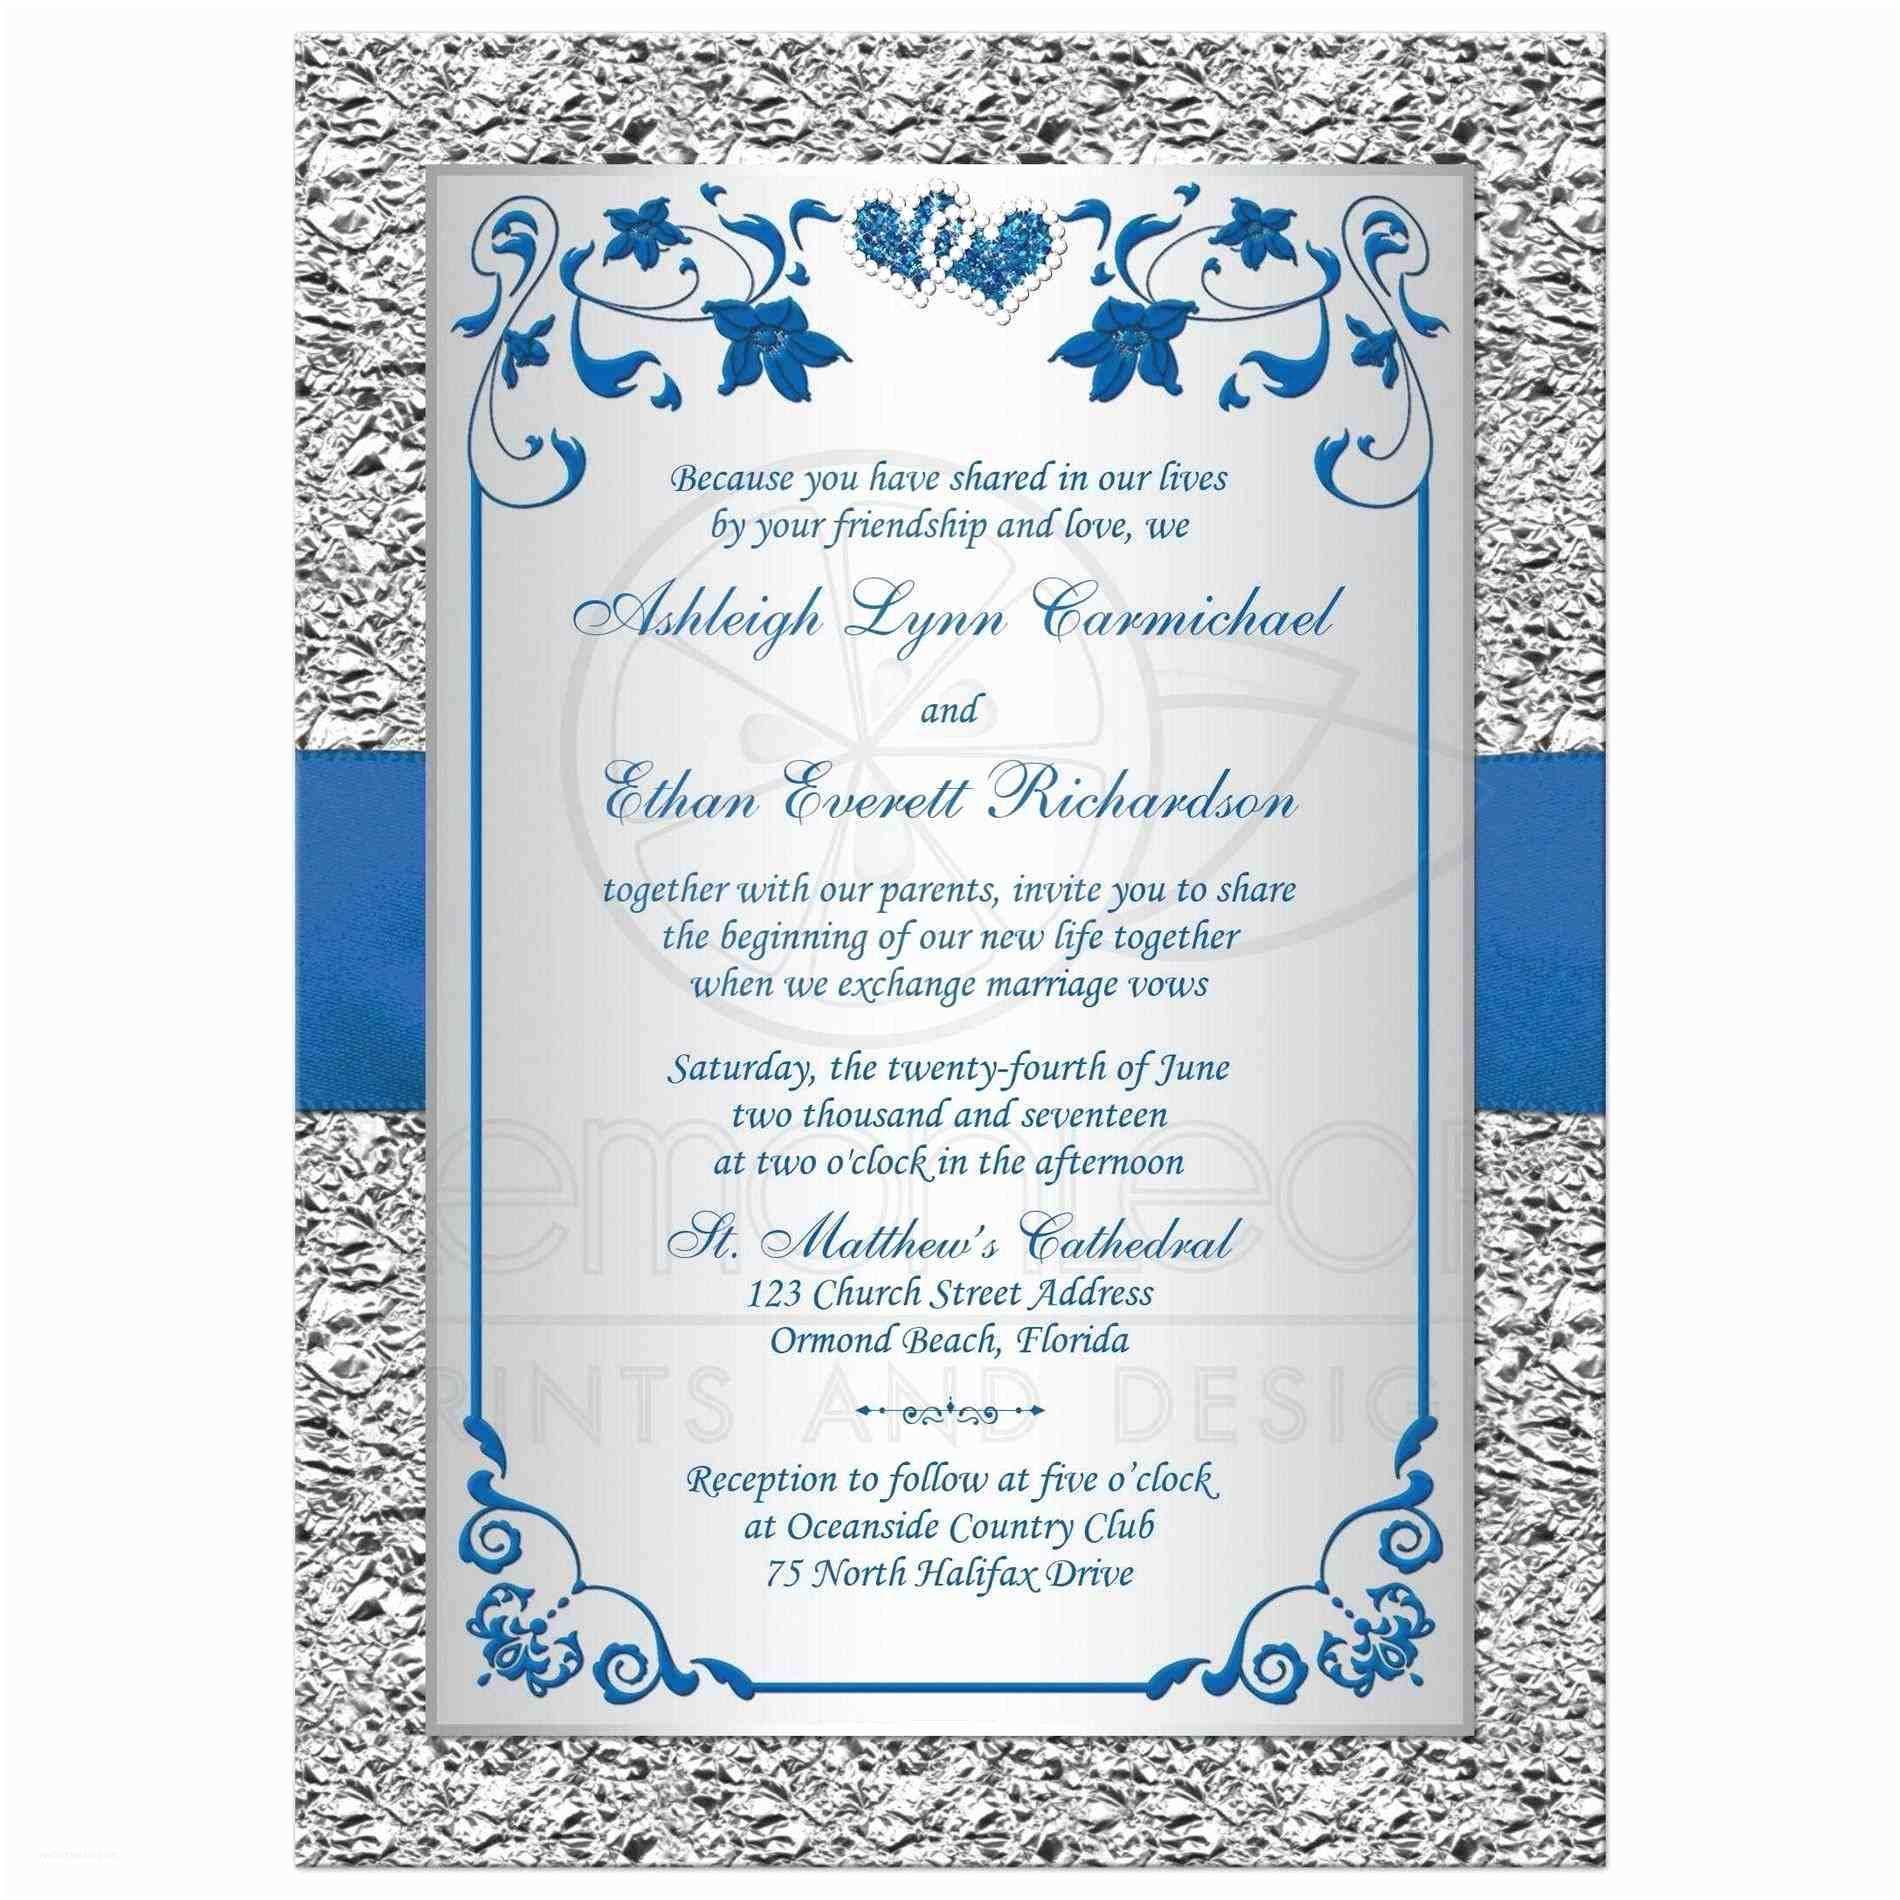 Royal Blue Wedding Invitations Royal Blue and Silver Wedding Invitations